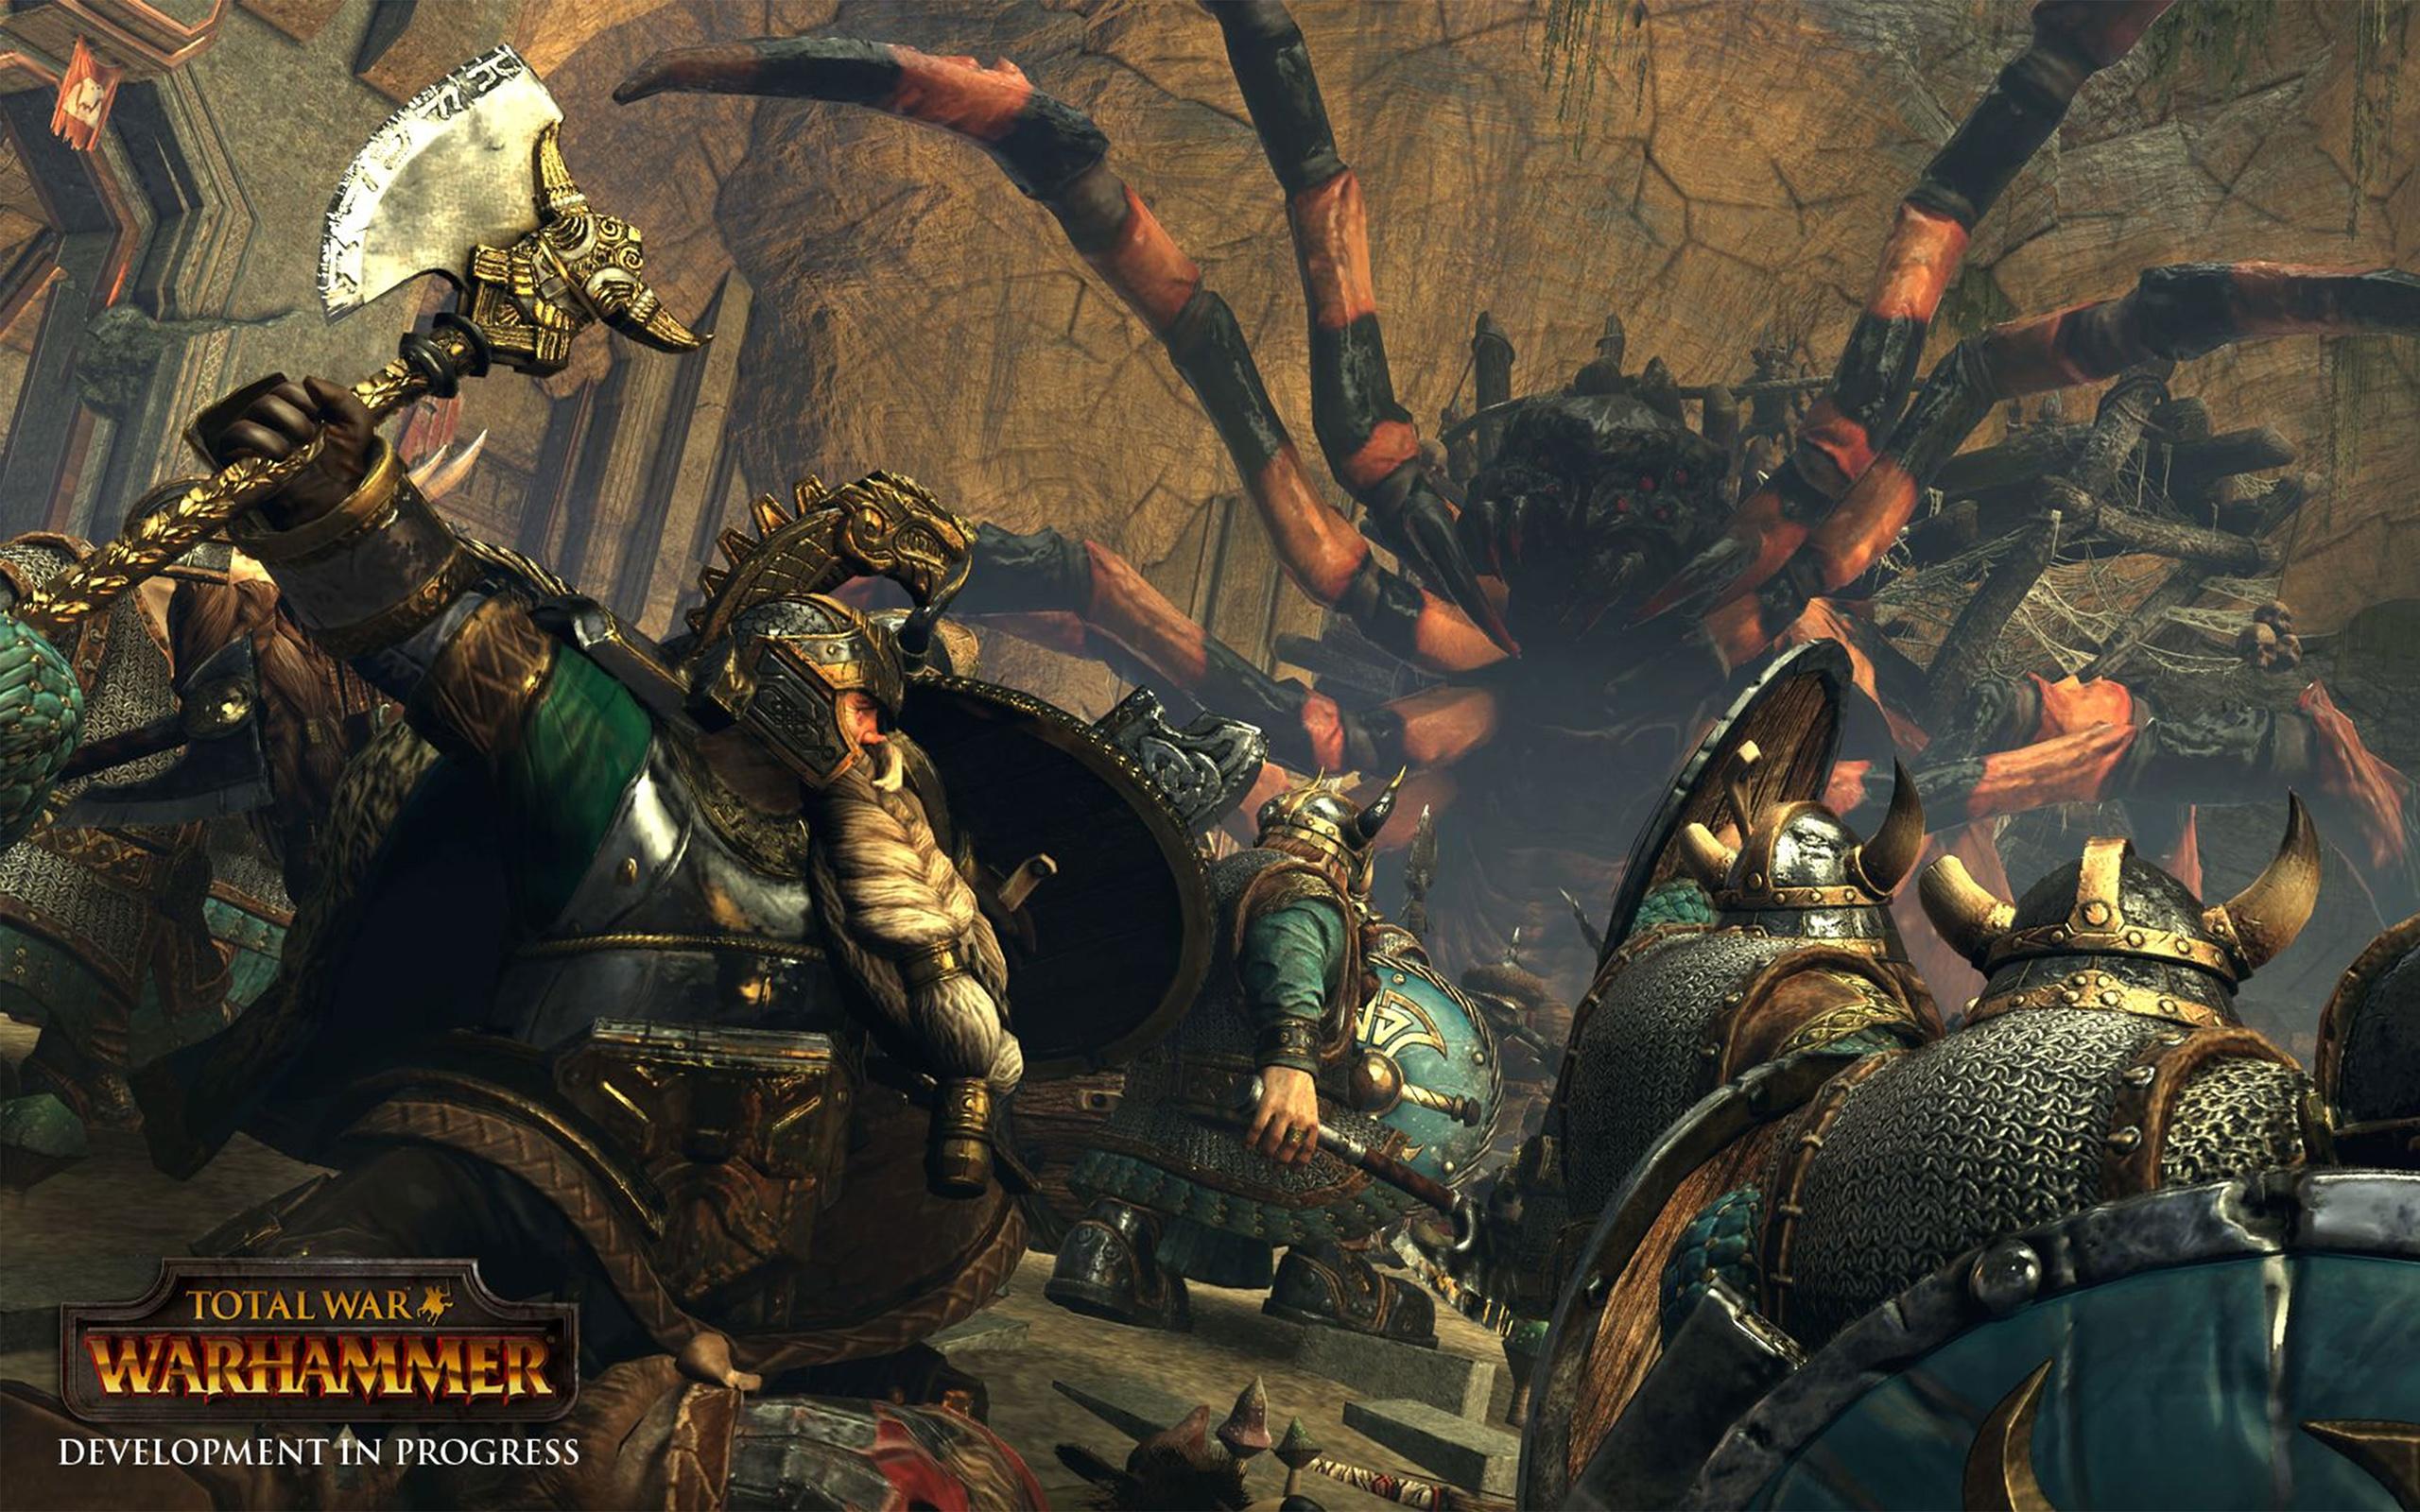 Обои Total War Warhammer total war warhammer, видео игры ...